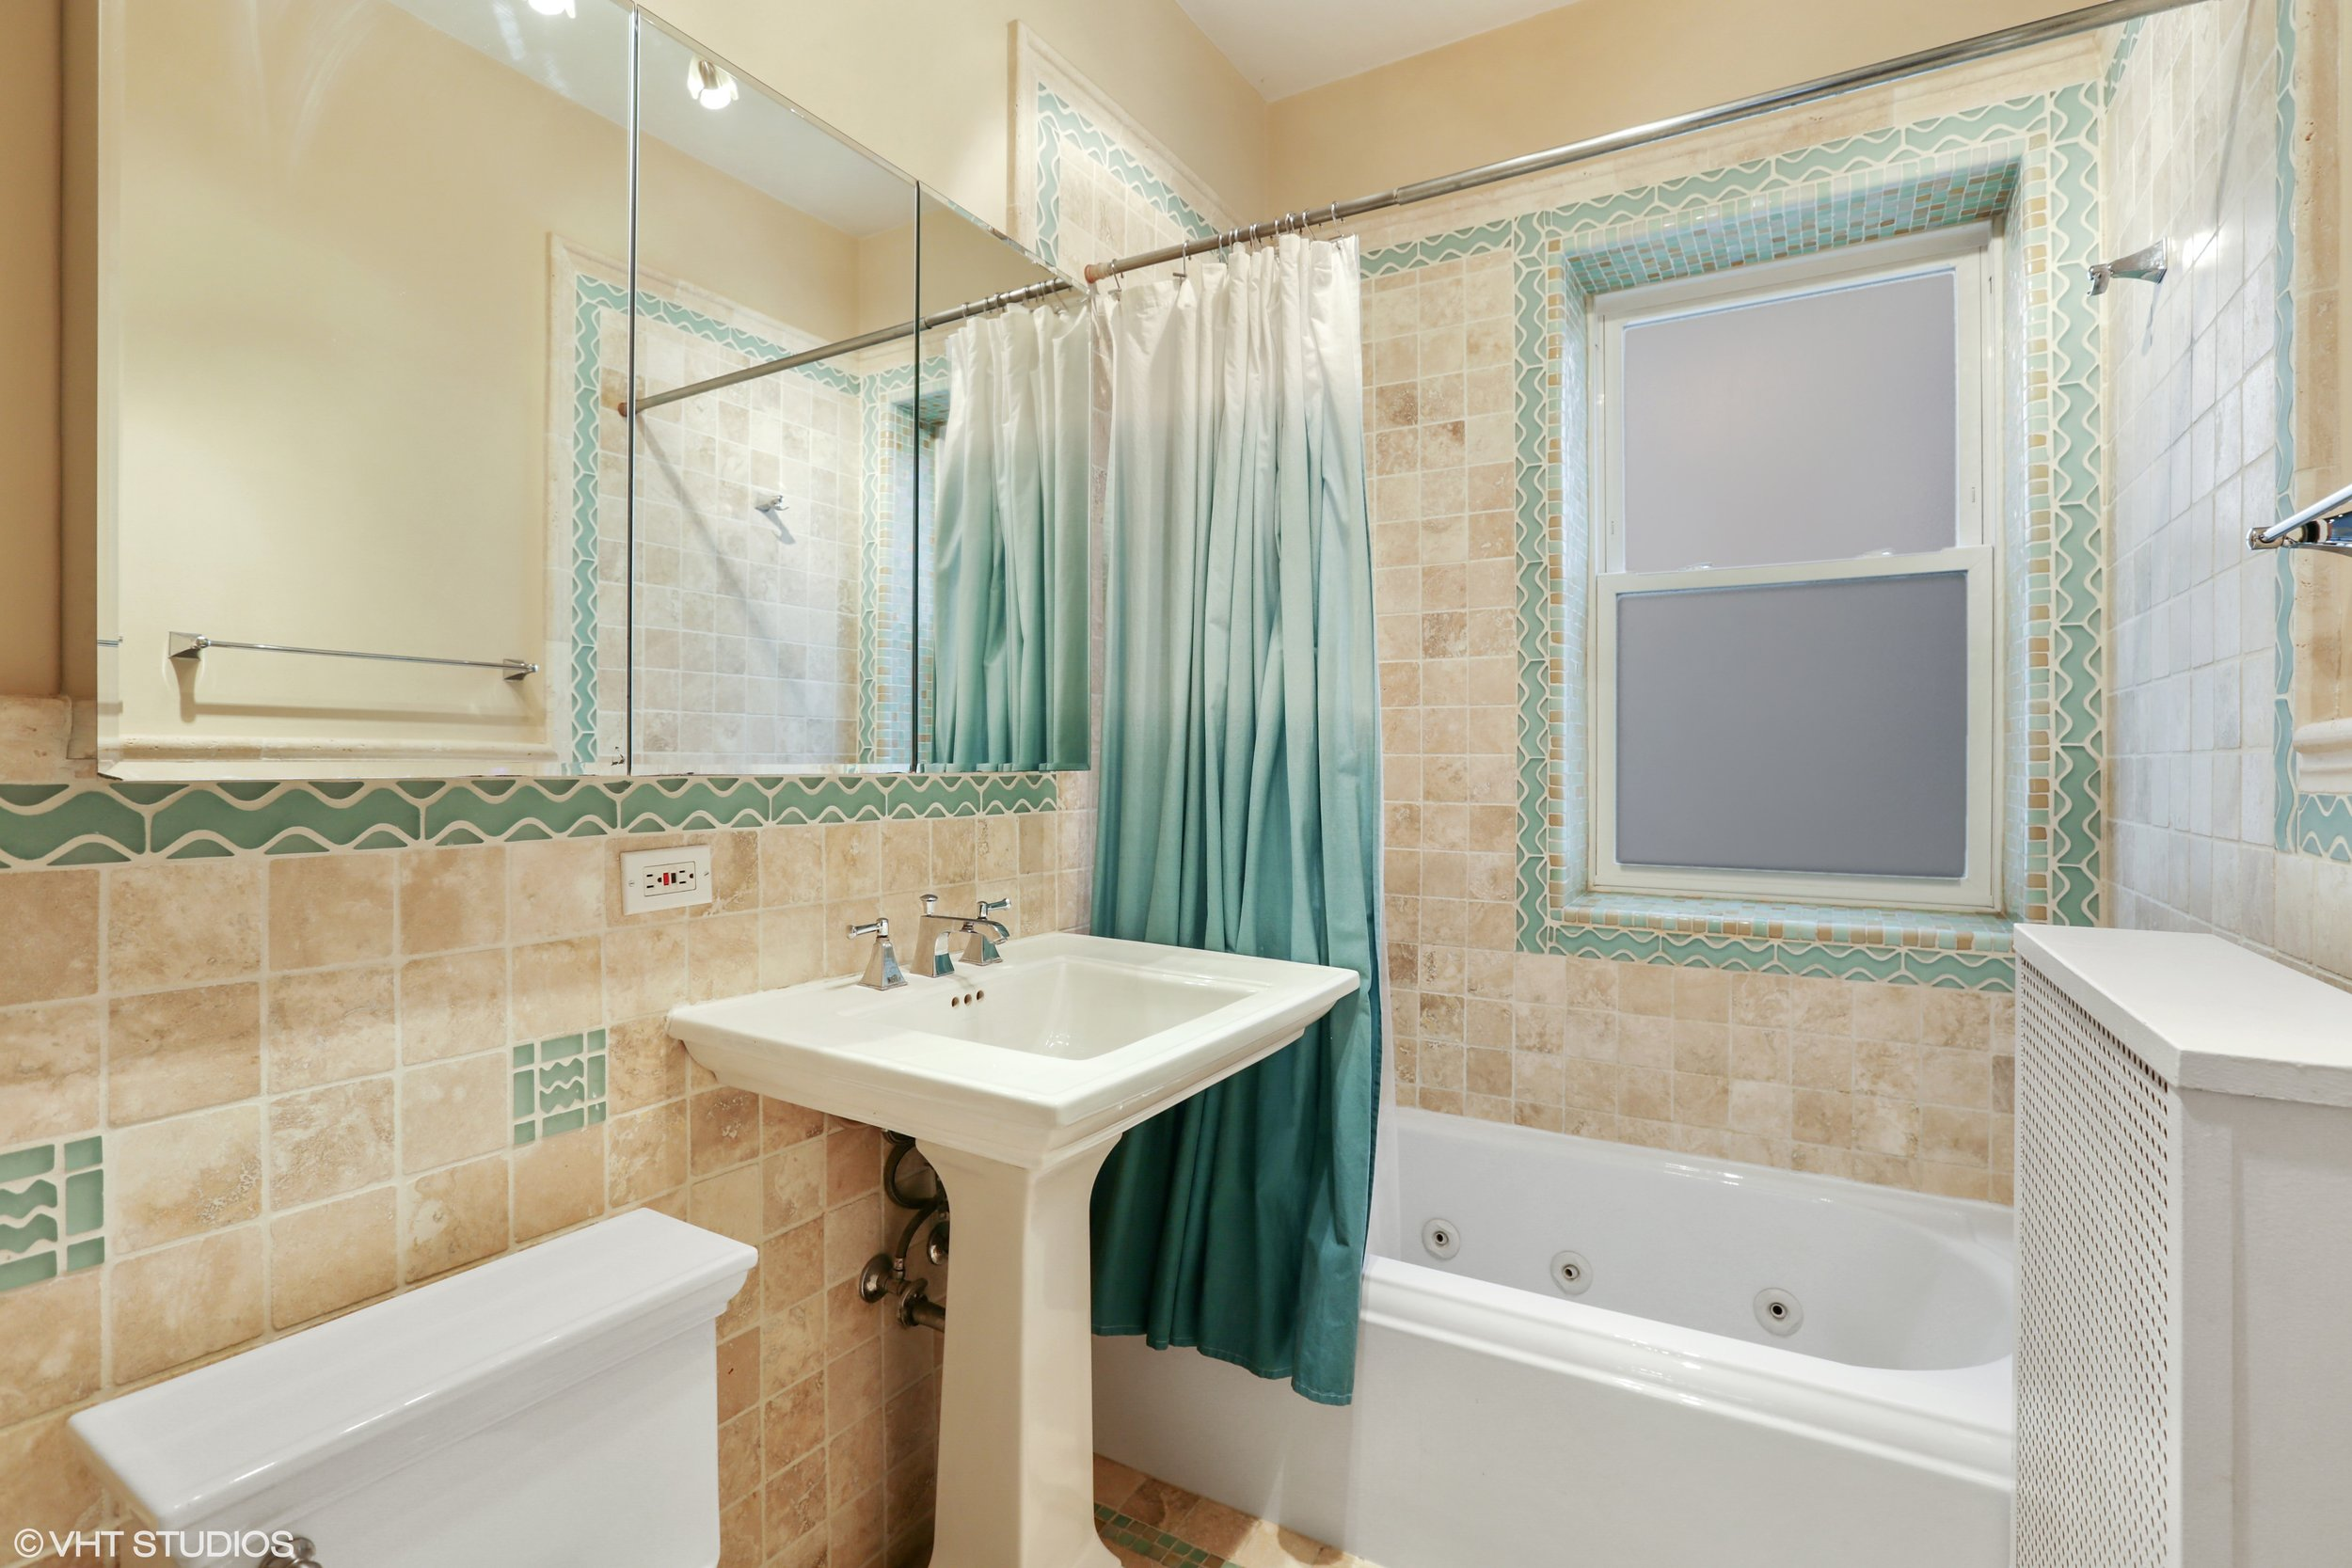 15_2948NorthPineGroveAve_2_8_Bathroom_HiRes.jpg